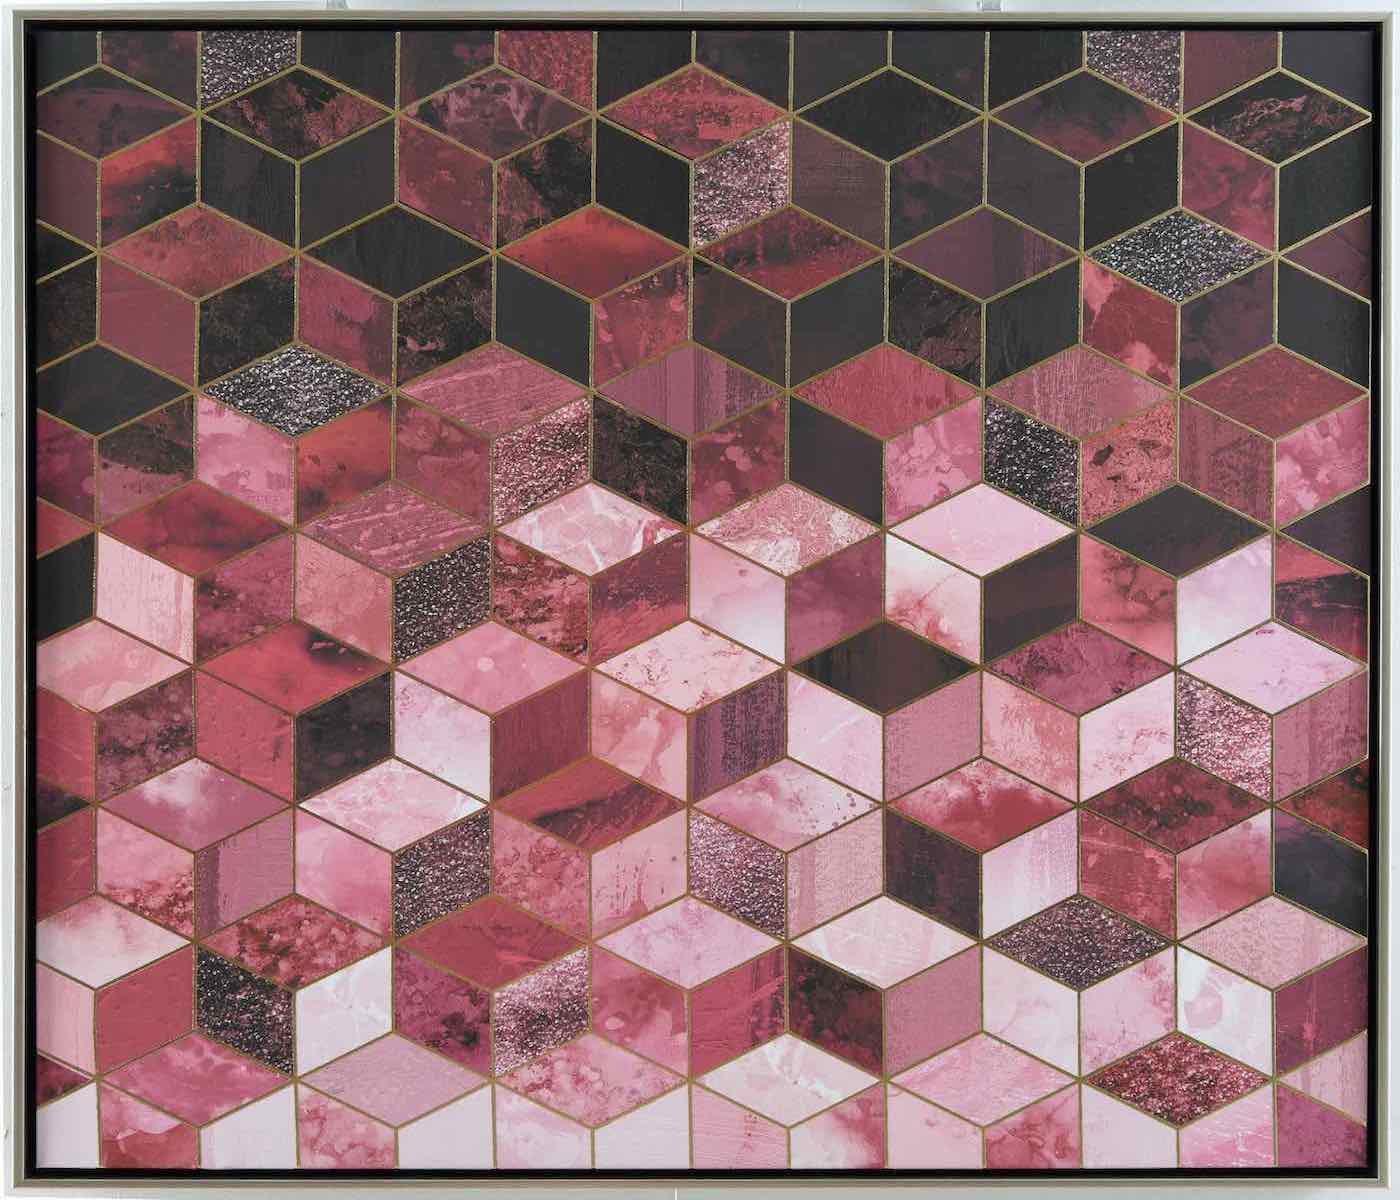 mazarin-ameublement-catalogue-produits-tableau-peinture-47